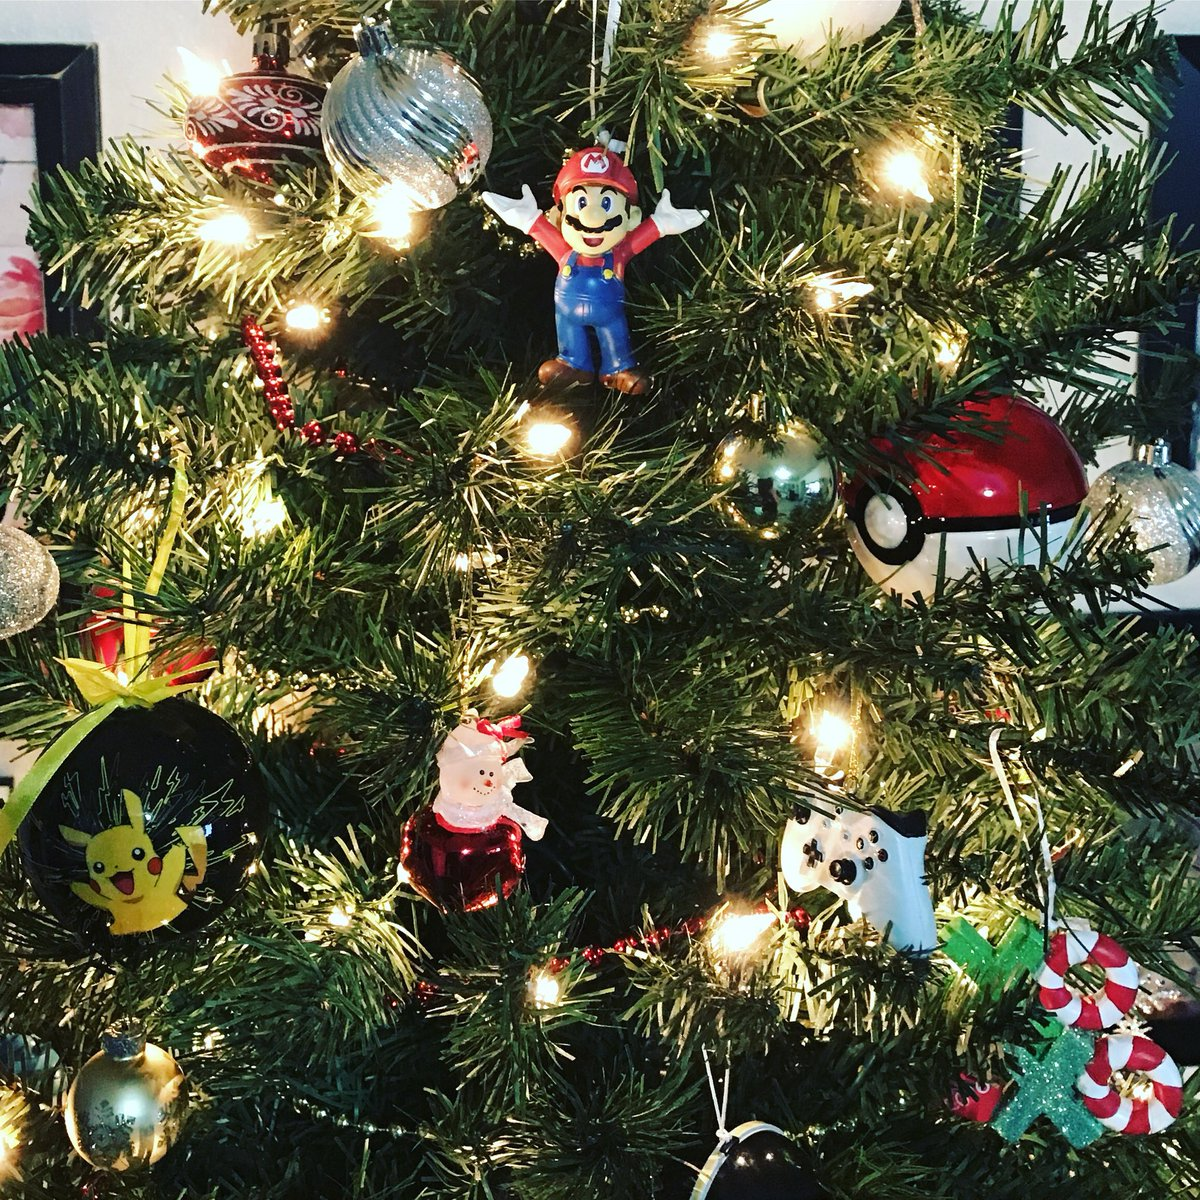 nerdchristmastree hashtag on Twitter